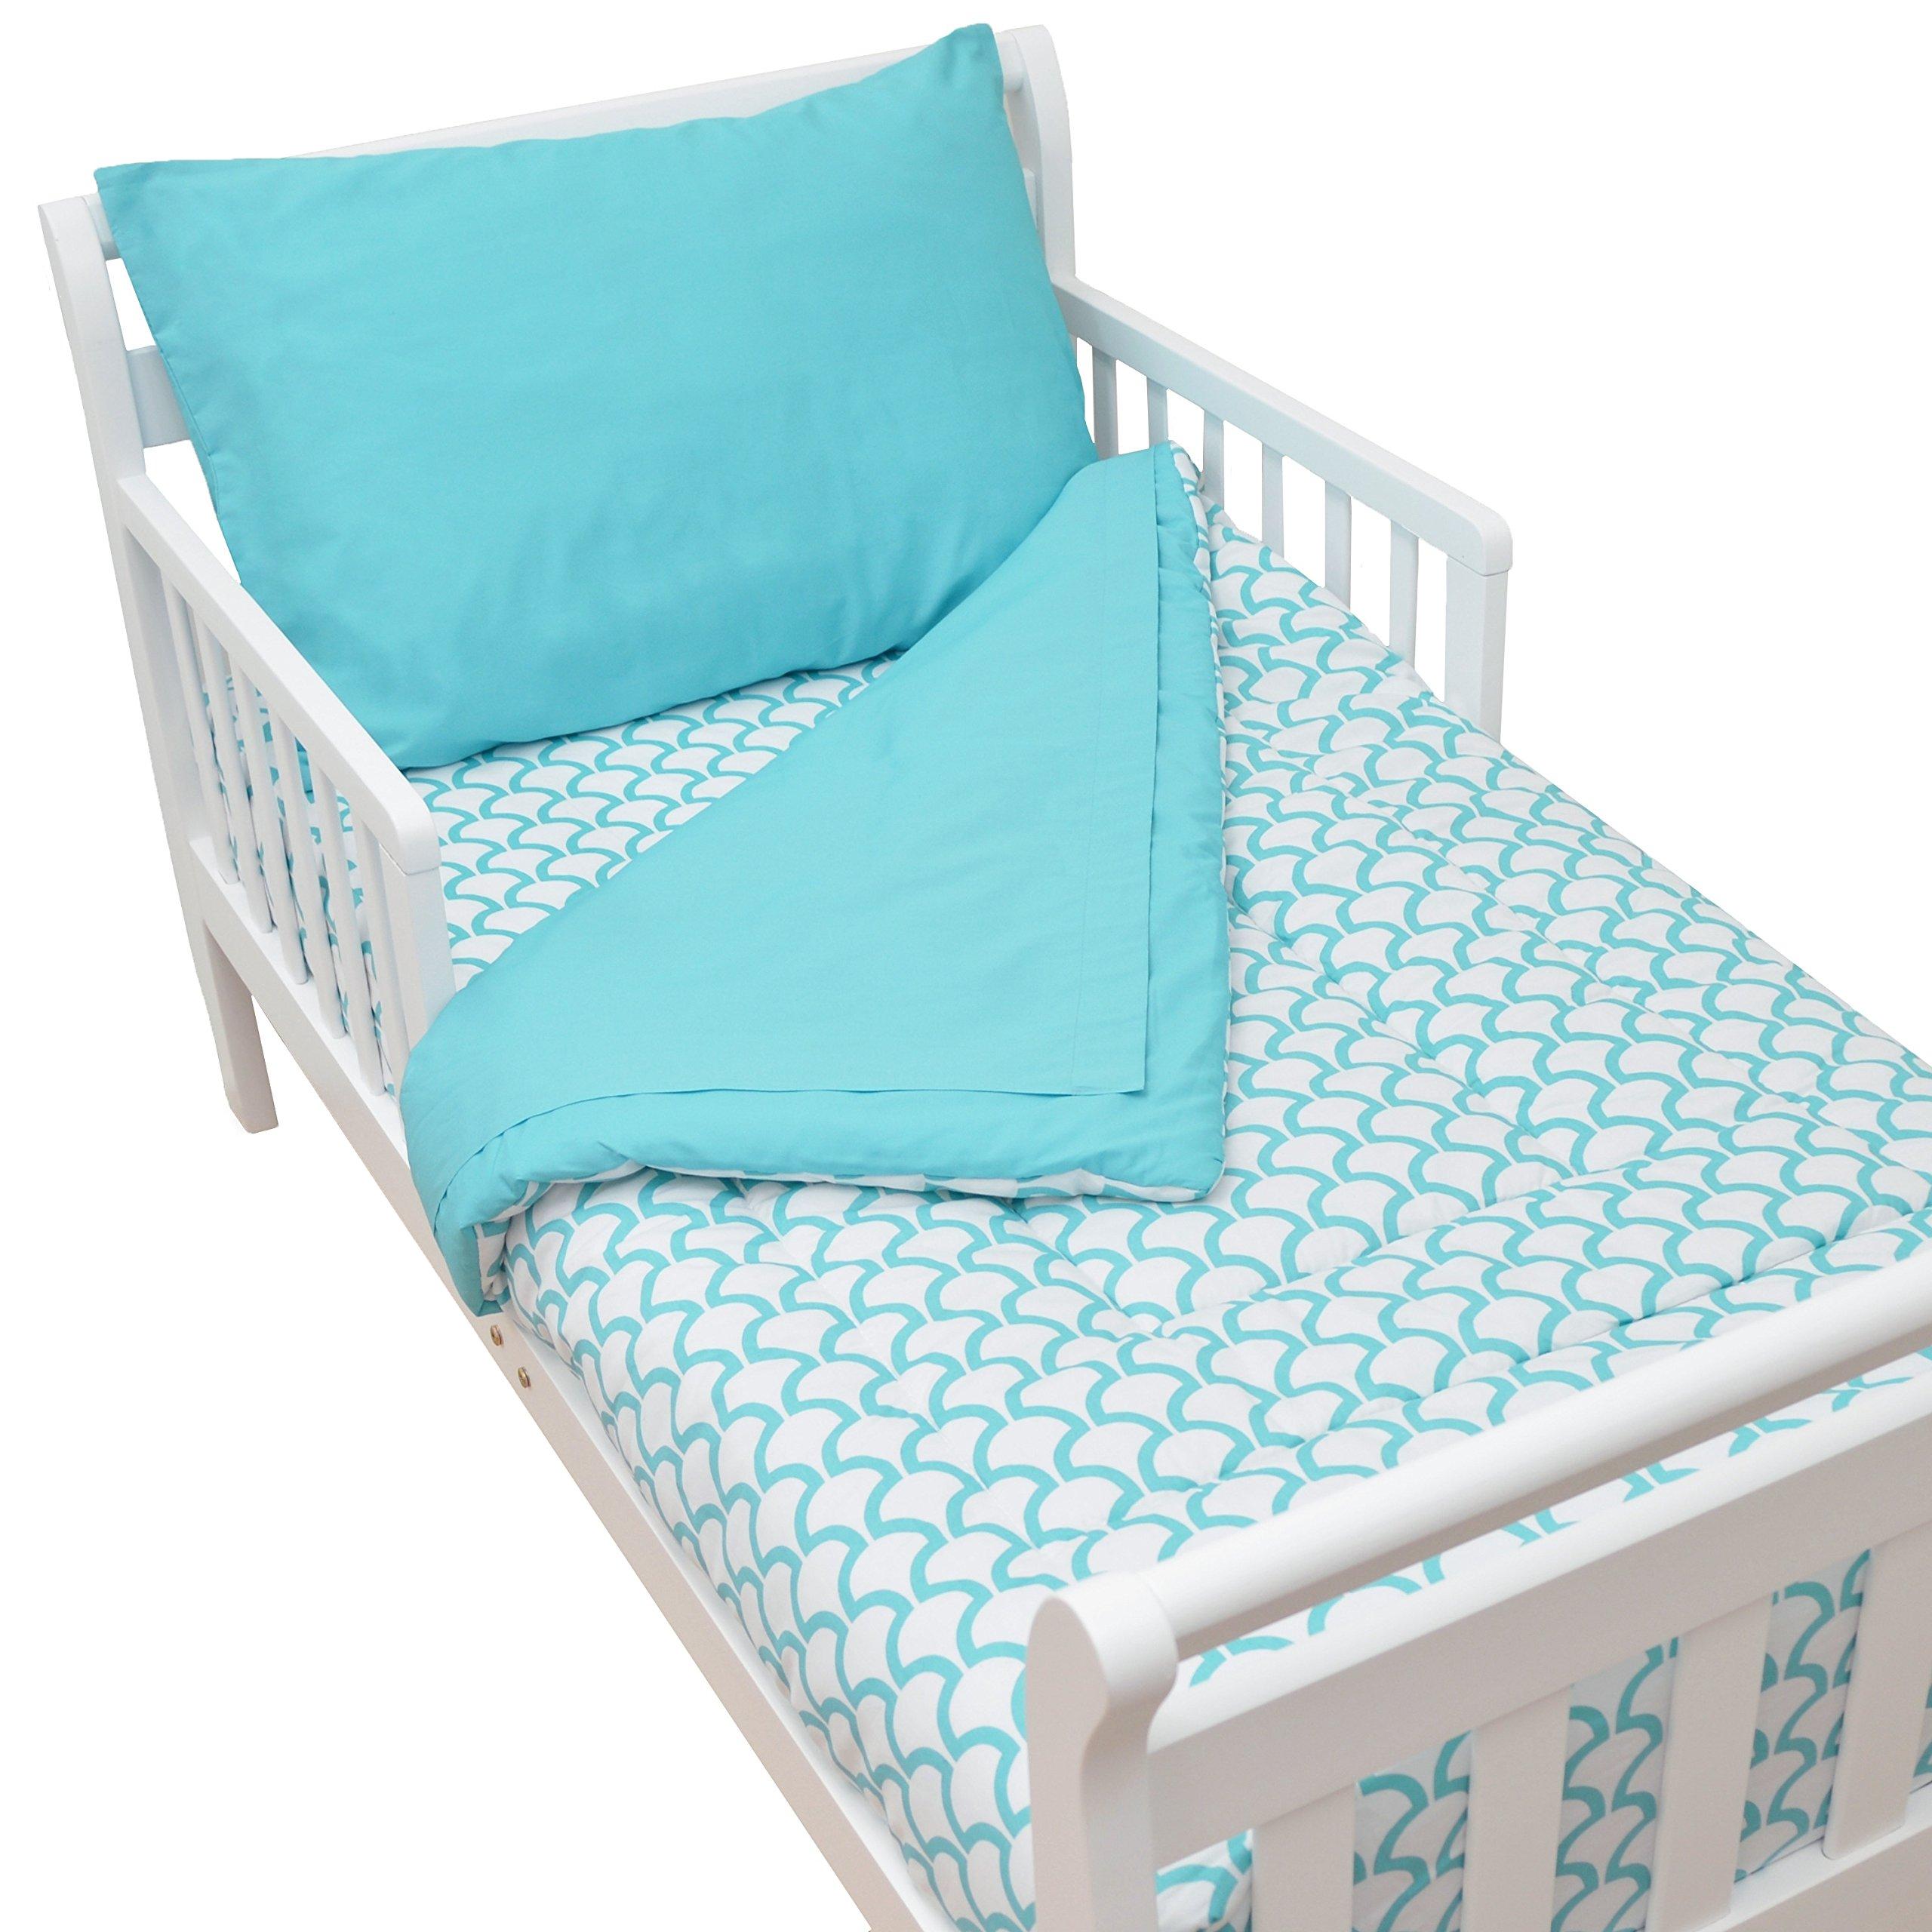 American Baby Company 100% Cotton Percale 4-piece Toddler Bedding Set, Aqua Sea Wave